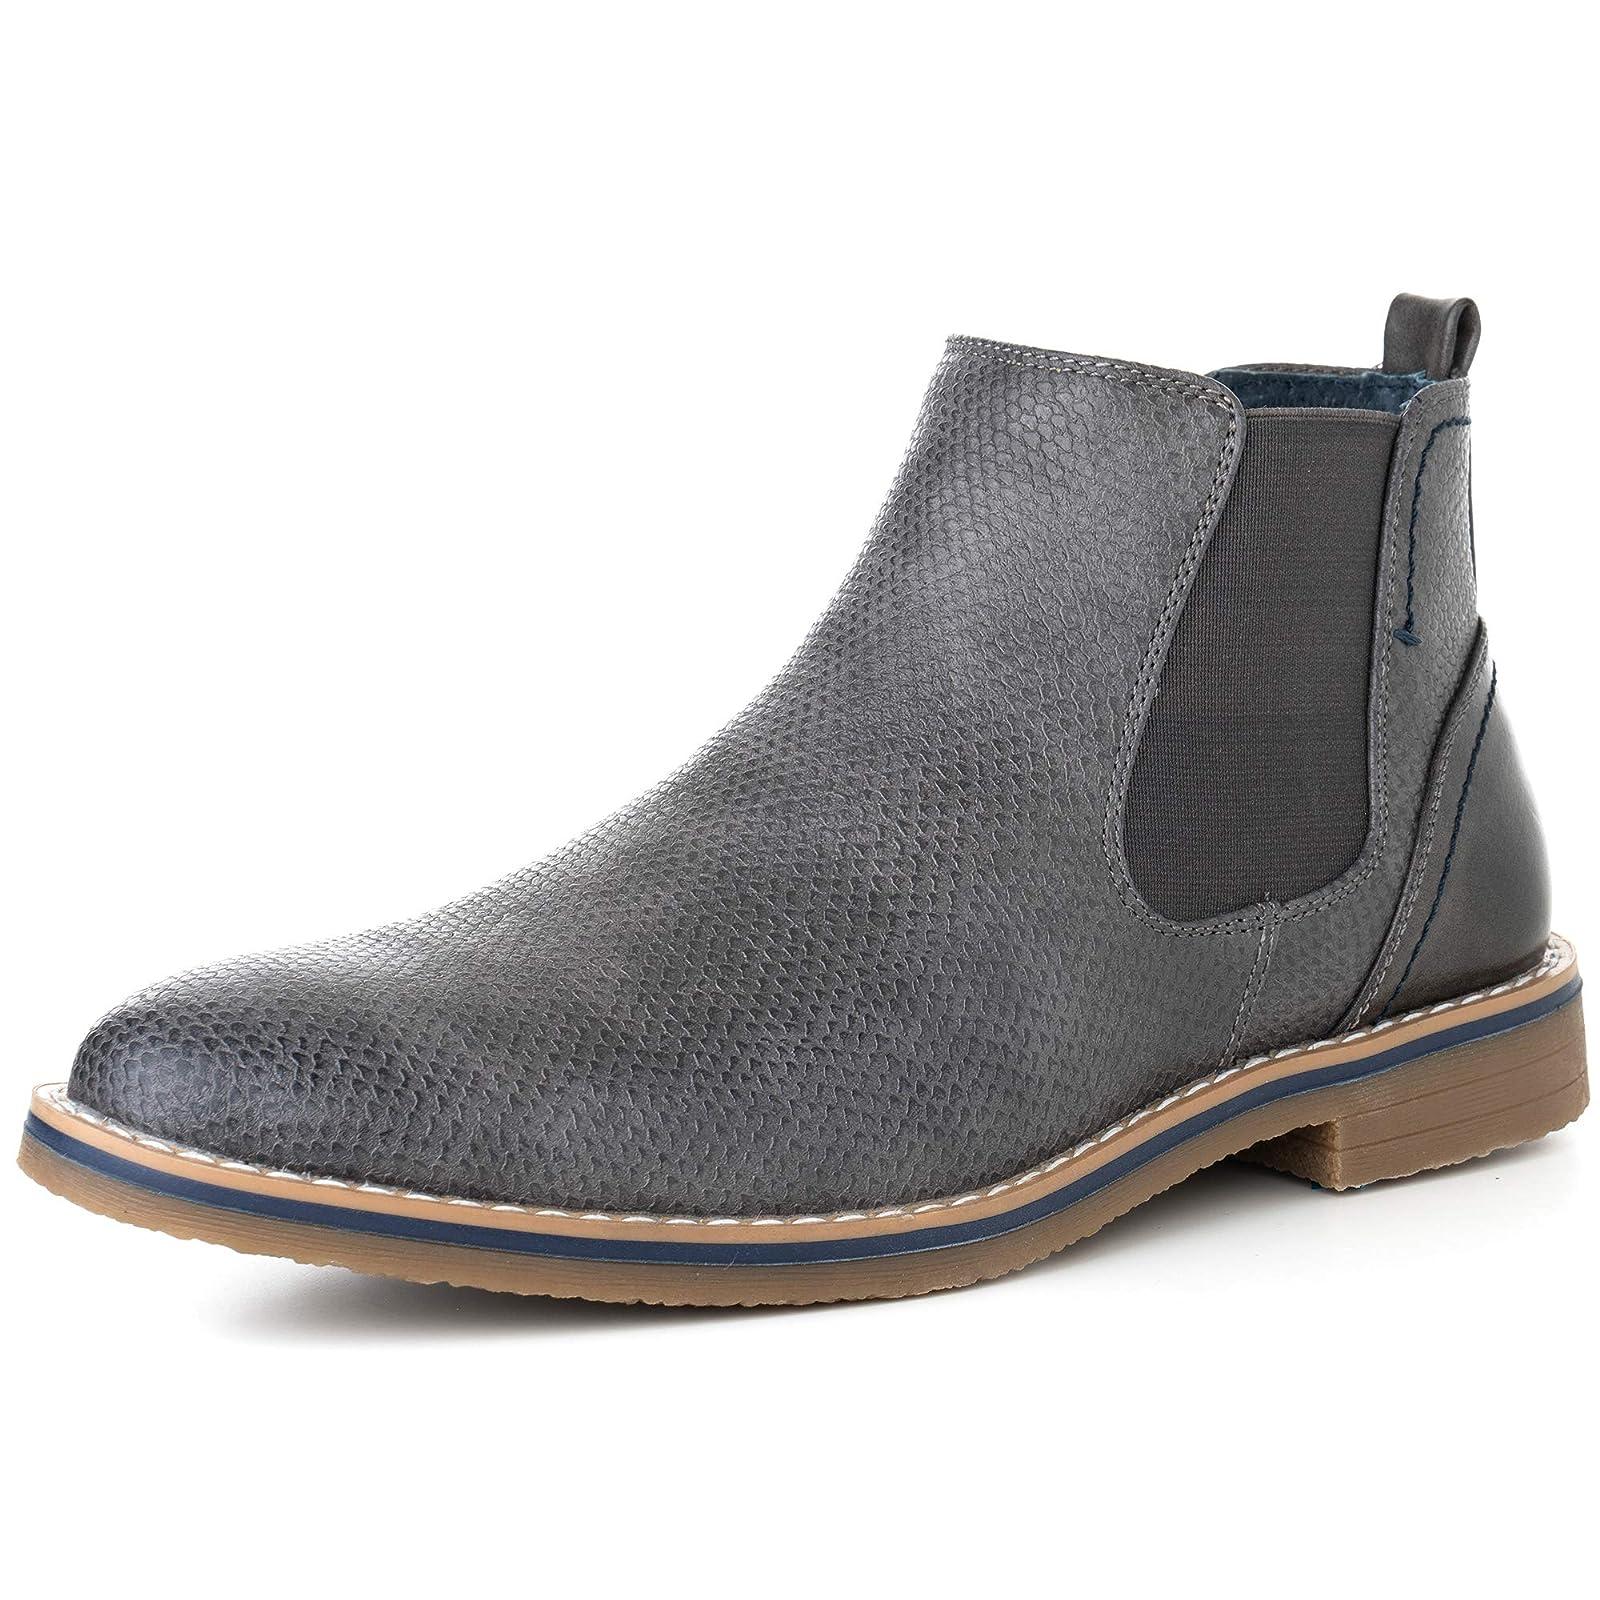 alpine swiss Men's Nash Chelsea Boots By Alpine Swiss - 1